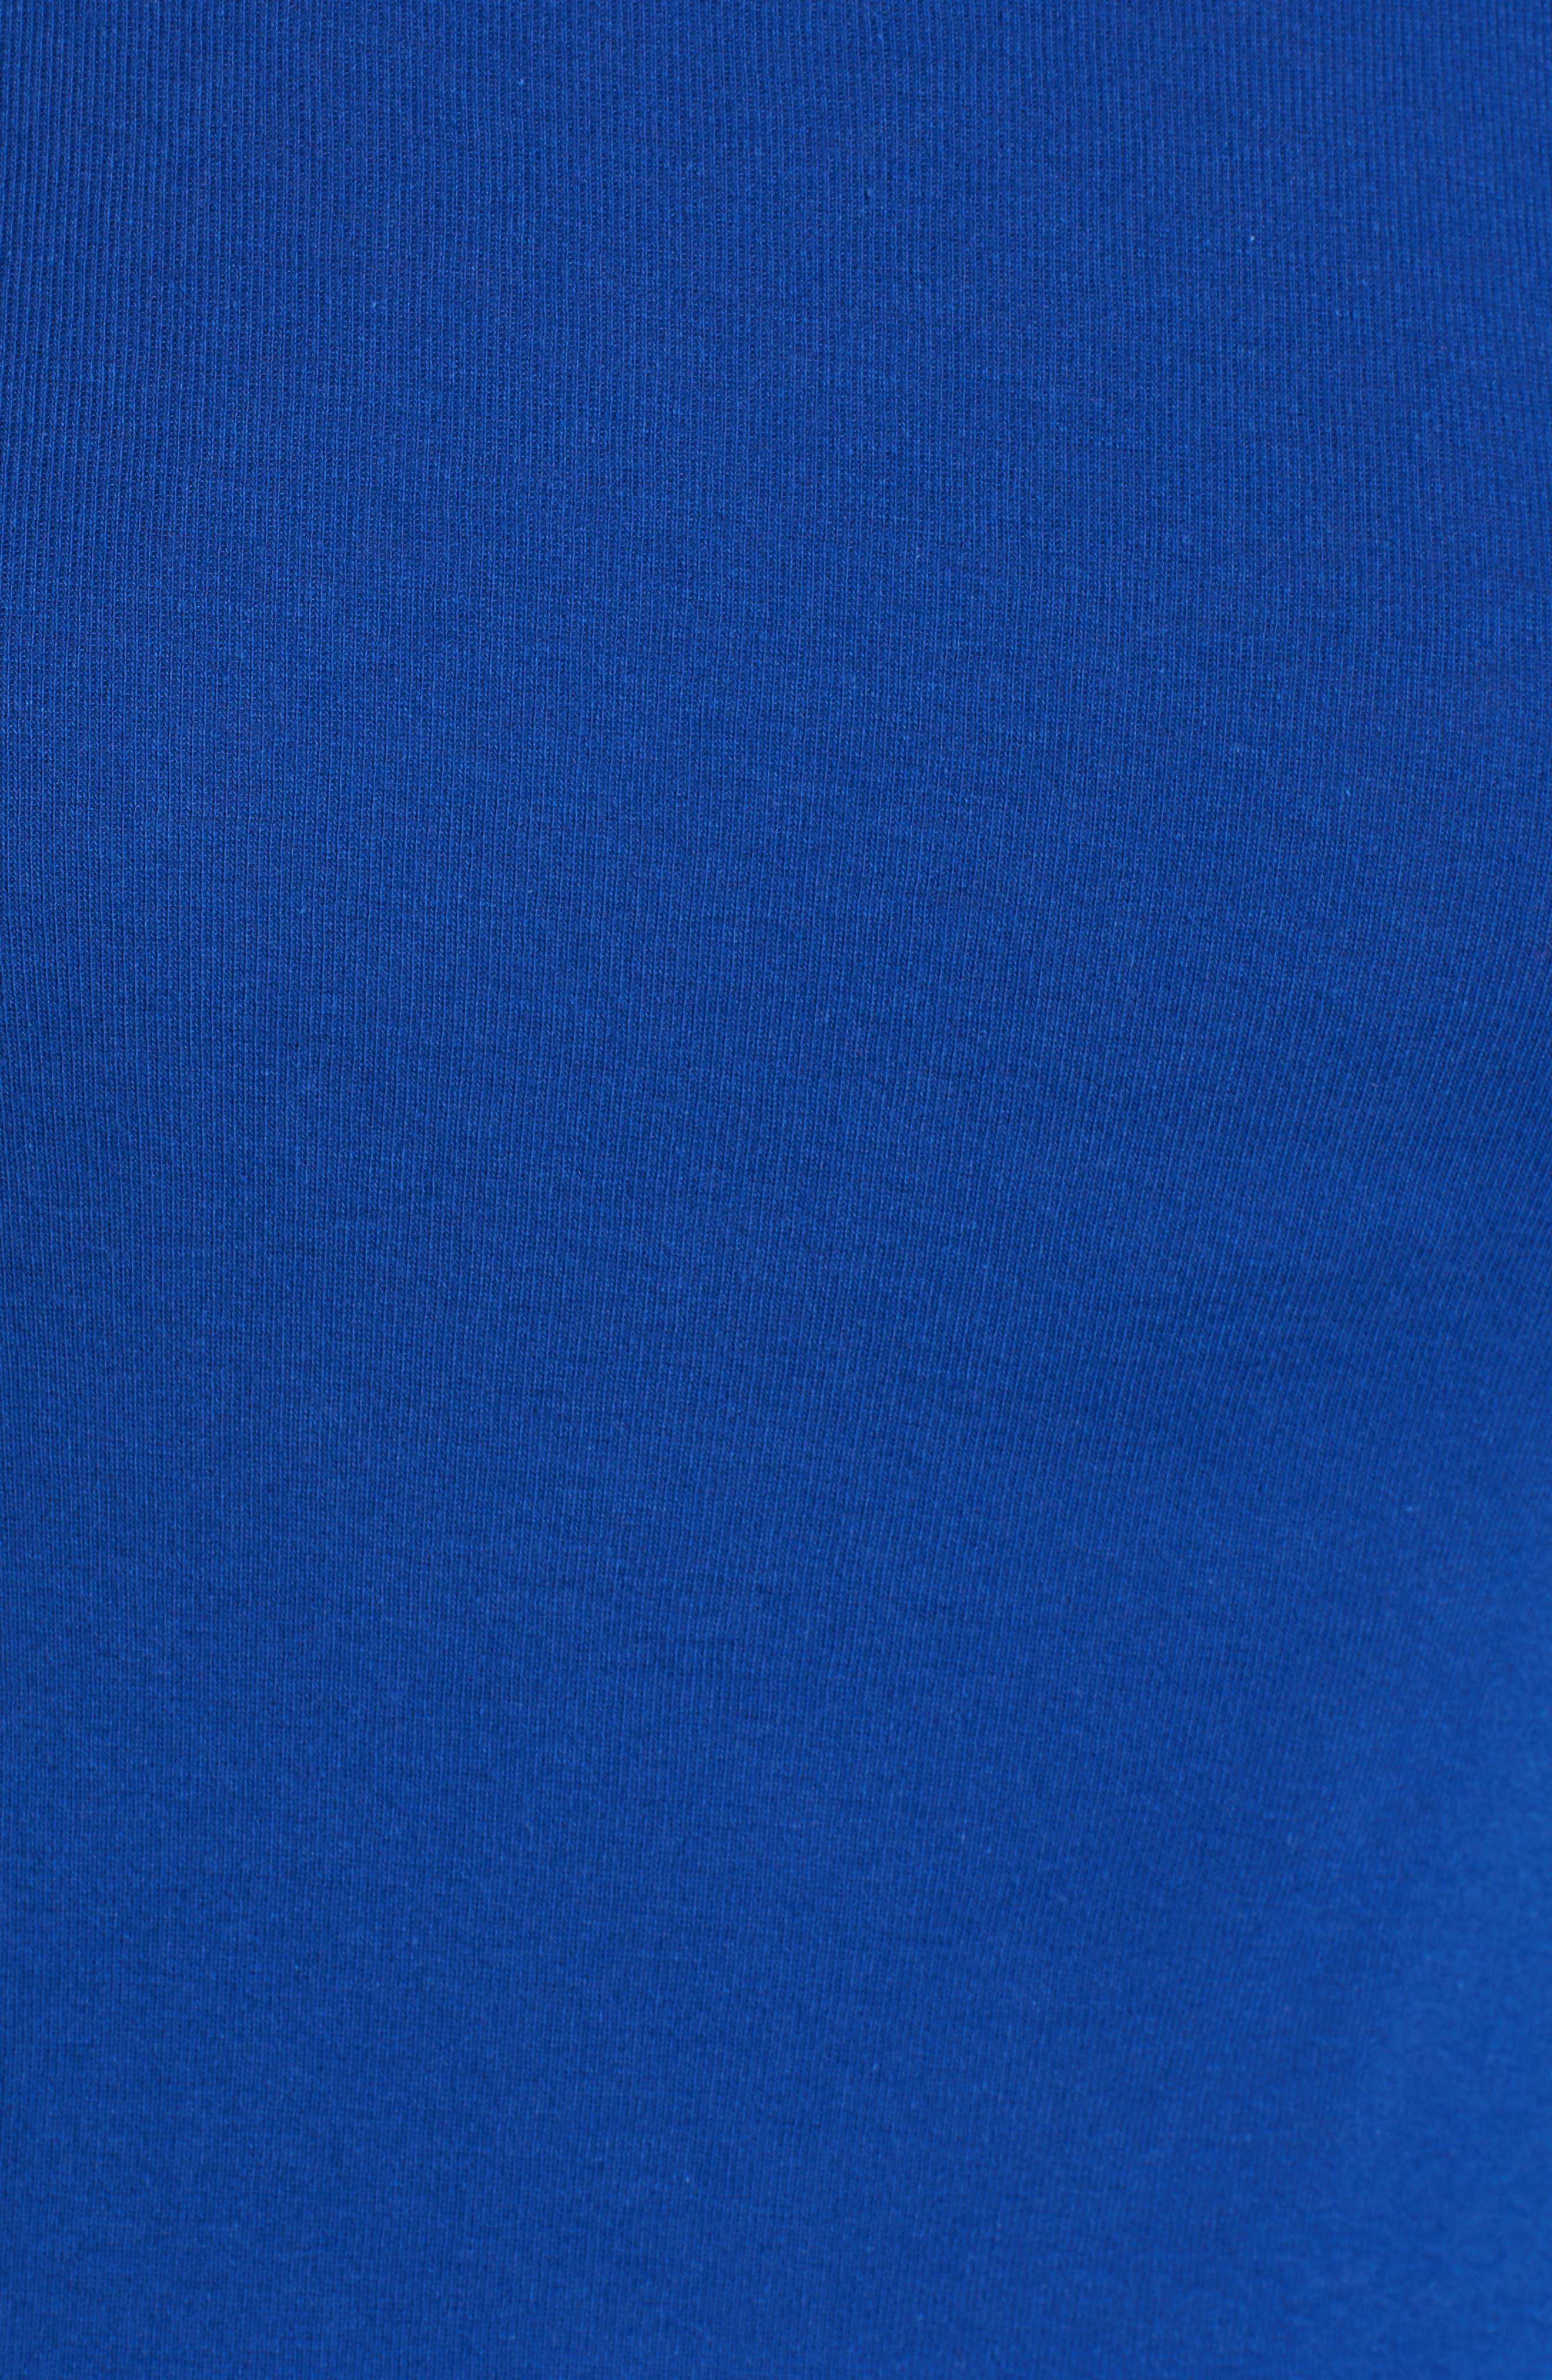 Alternate Image 5  - Caslon® Long Sleeve Scoop Neck Cotton Tee (Regular & Petite)